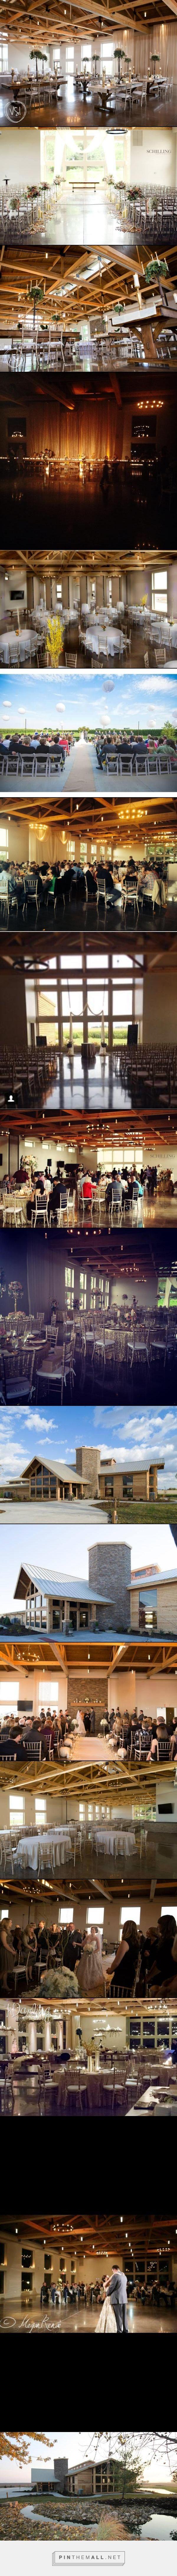 best future wedding images on pinterest wedding ideas wedding